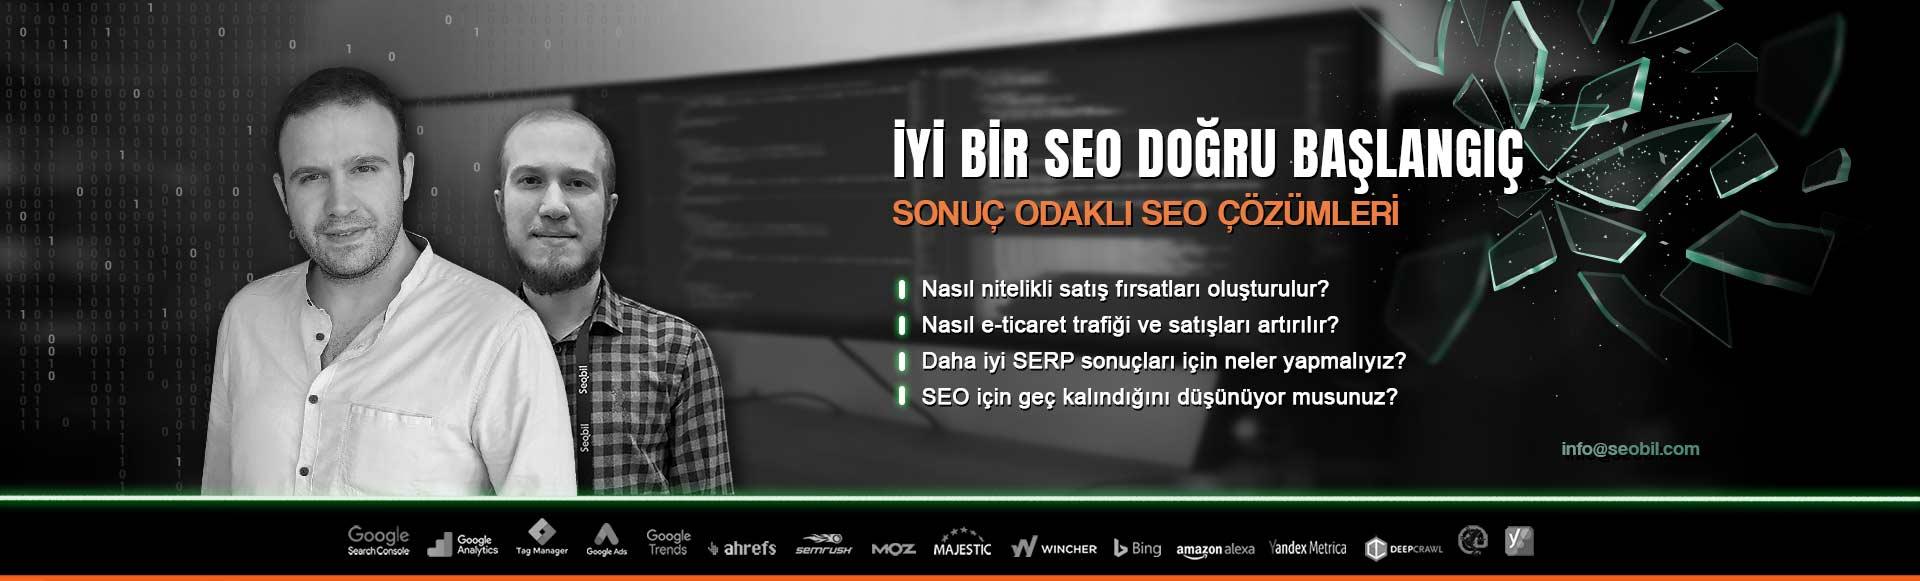 seobil.com